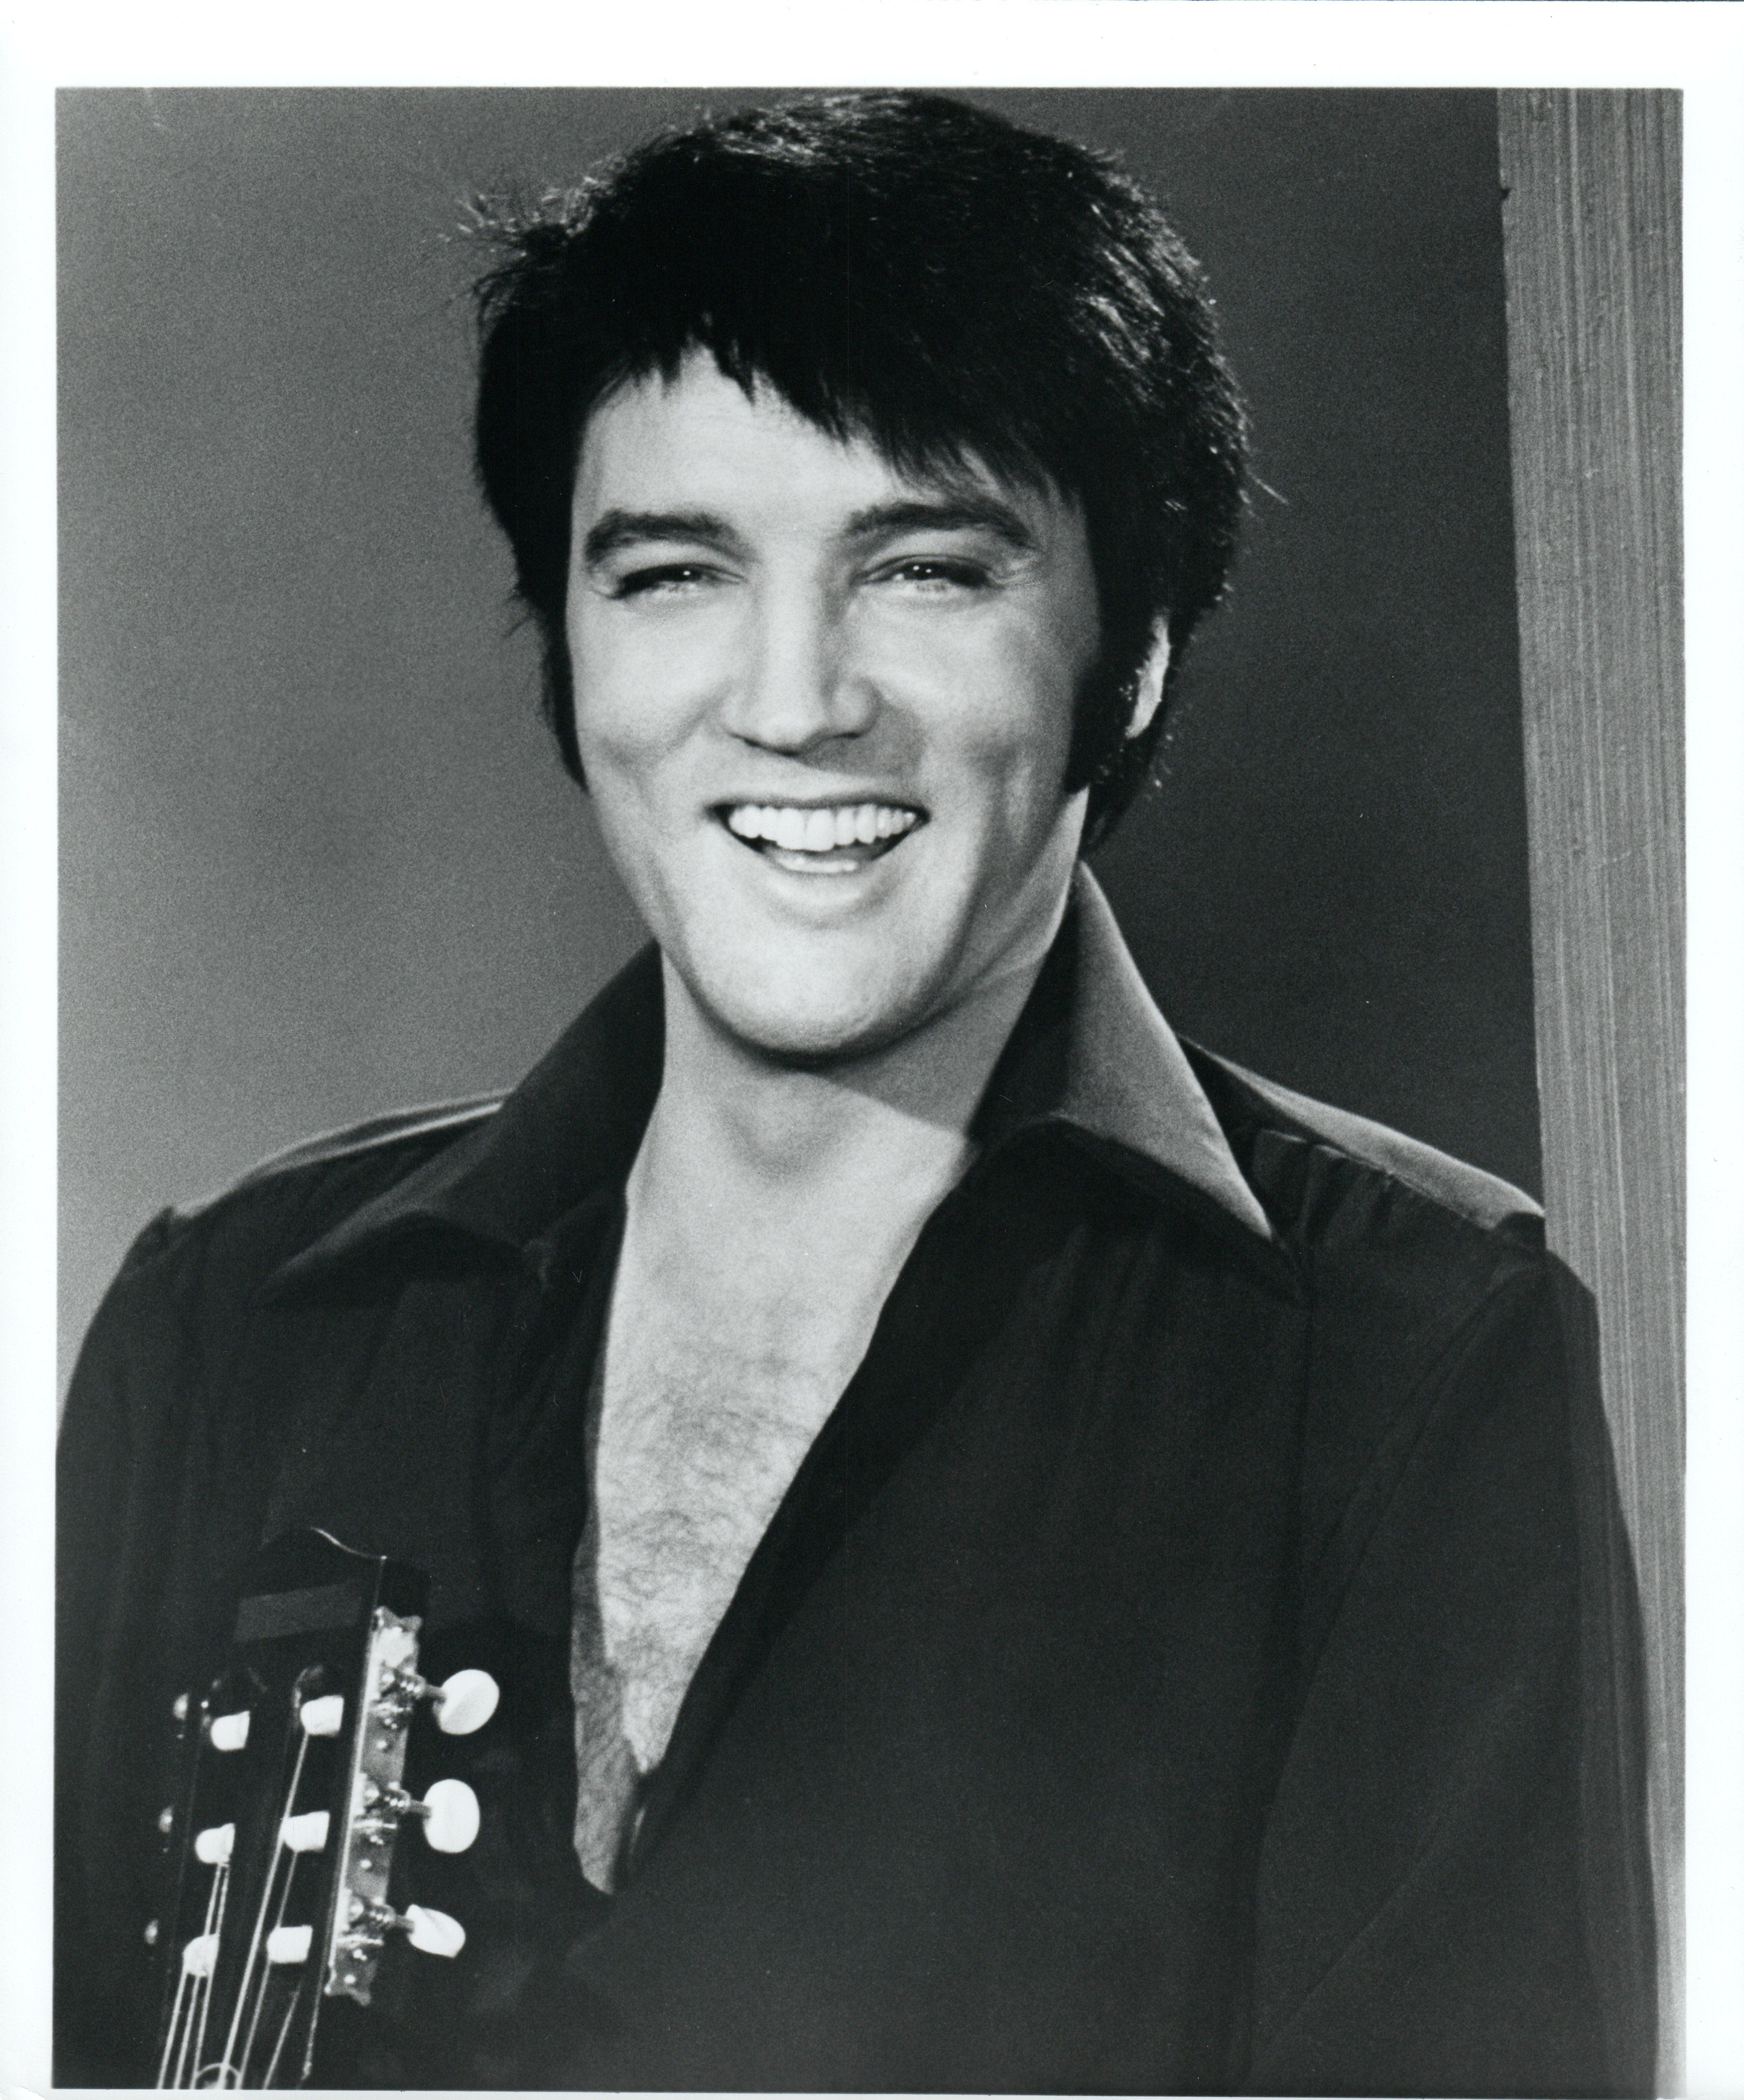 Elvis smiling vintage original photograph